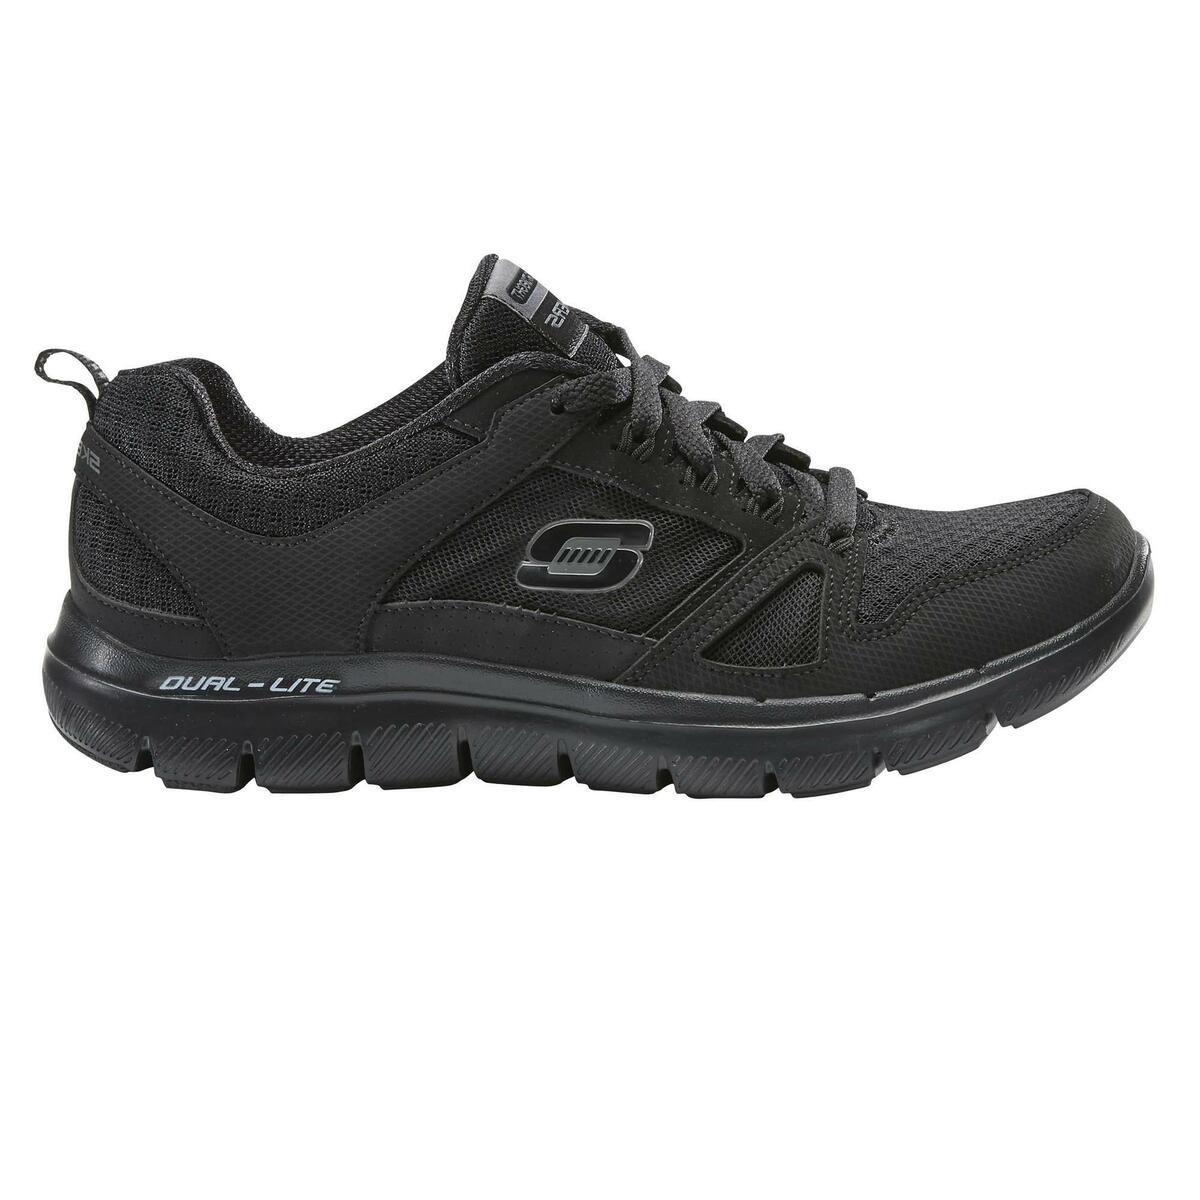 Bild 1 von Walkingschuhe Flex Dual Lite Damen schwarz